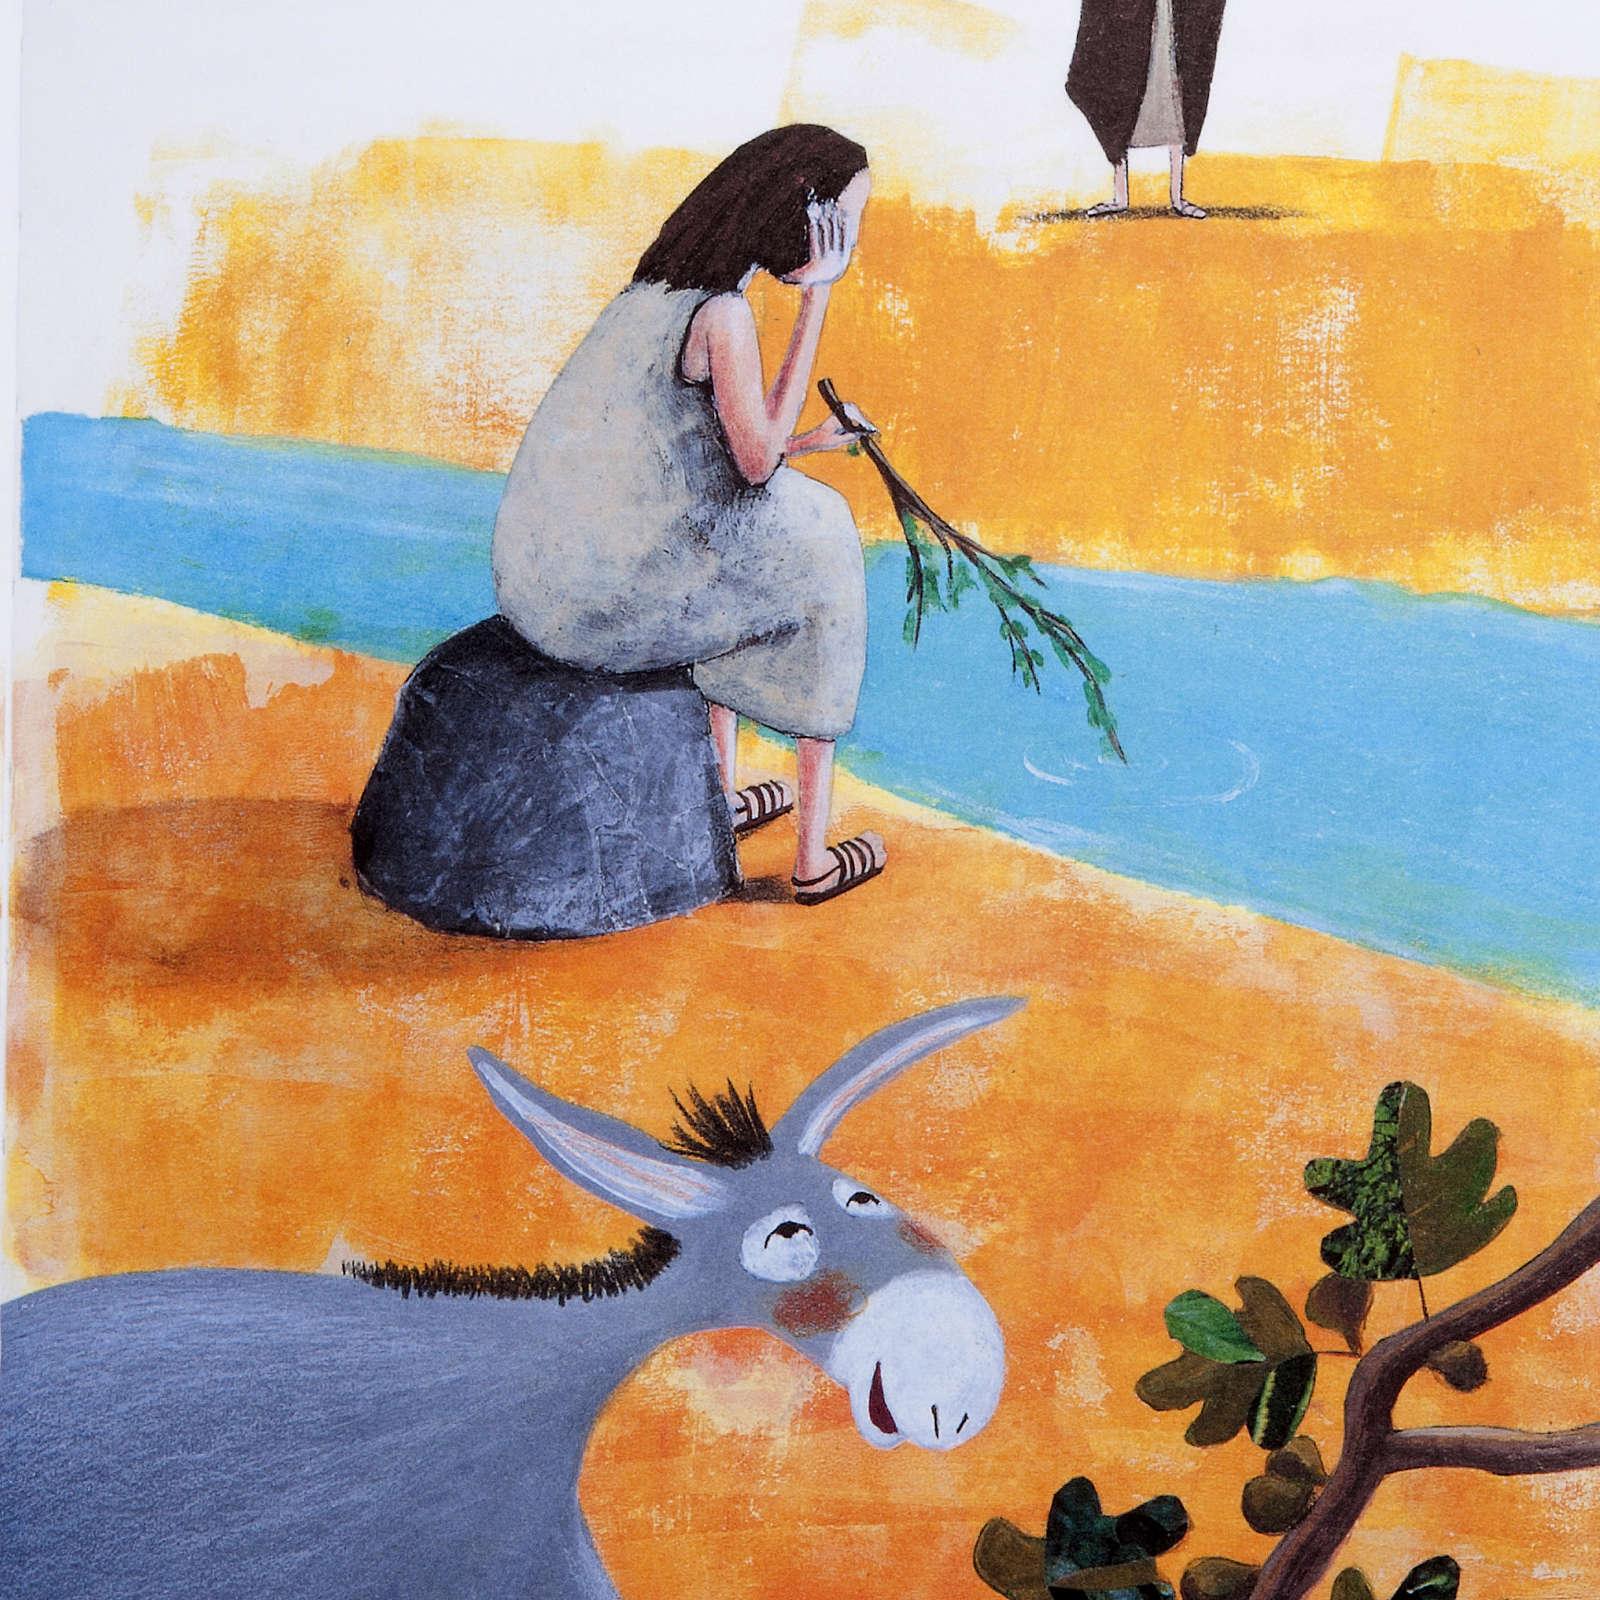 Io c'ero: un asino racconta Gesù 4